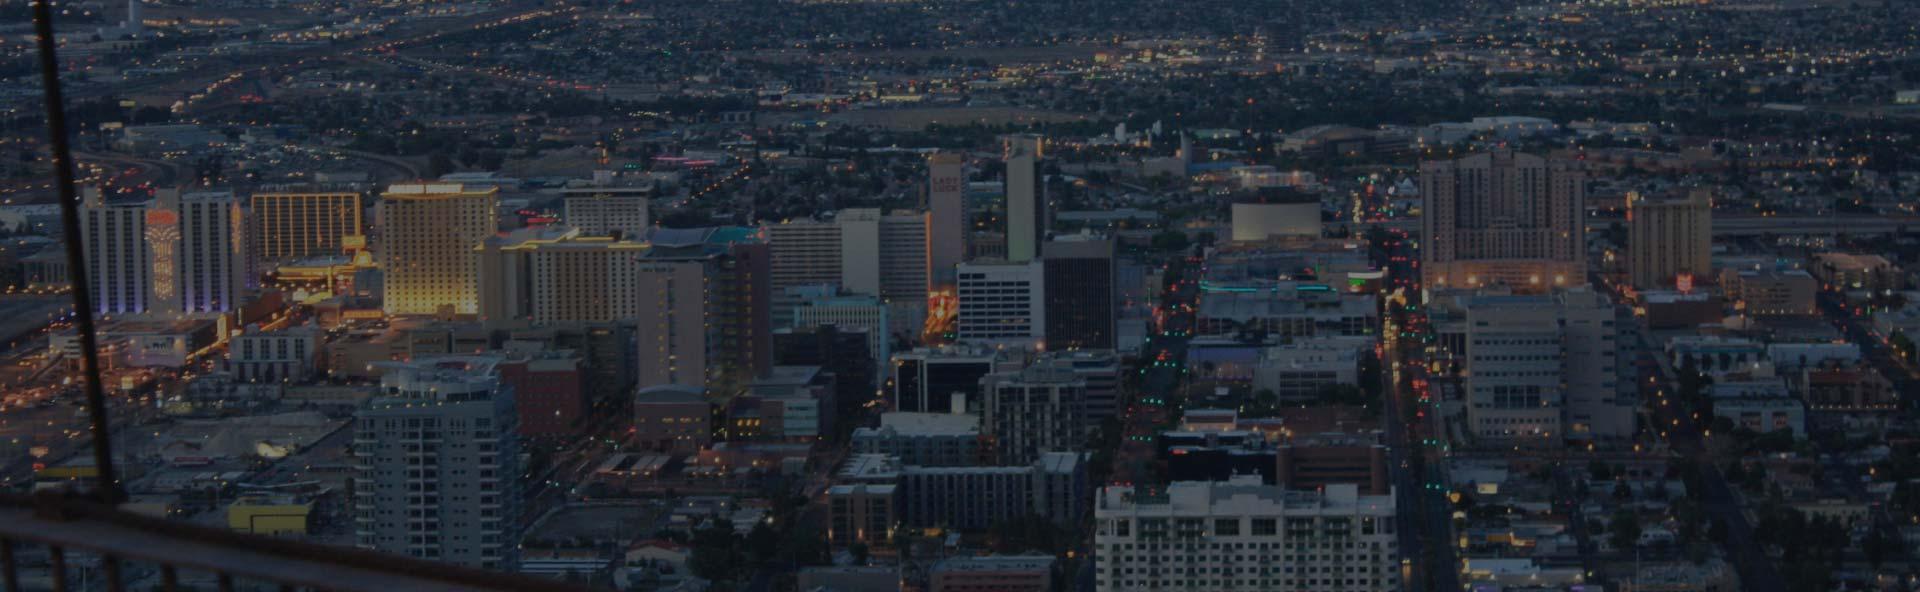 NAHREP Las Vegas can help YOU build your business